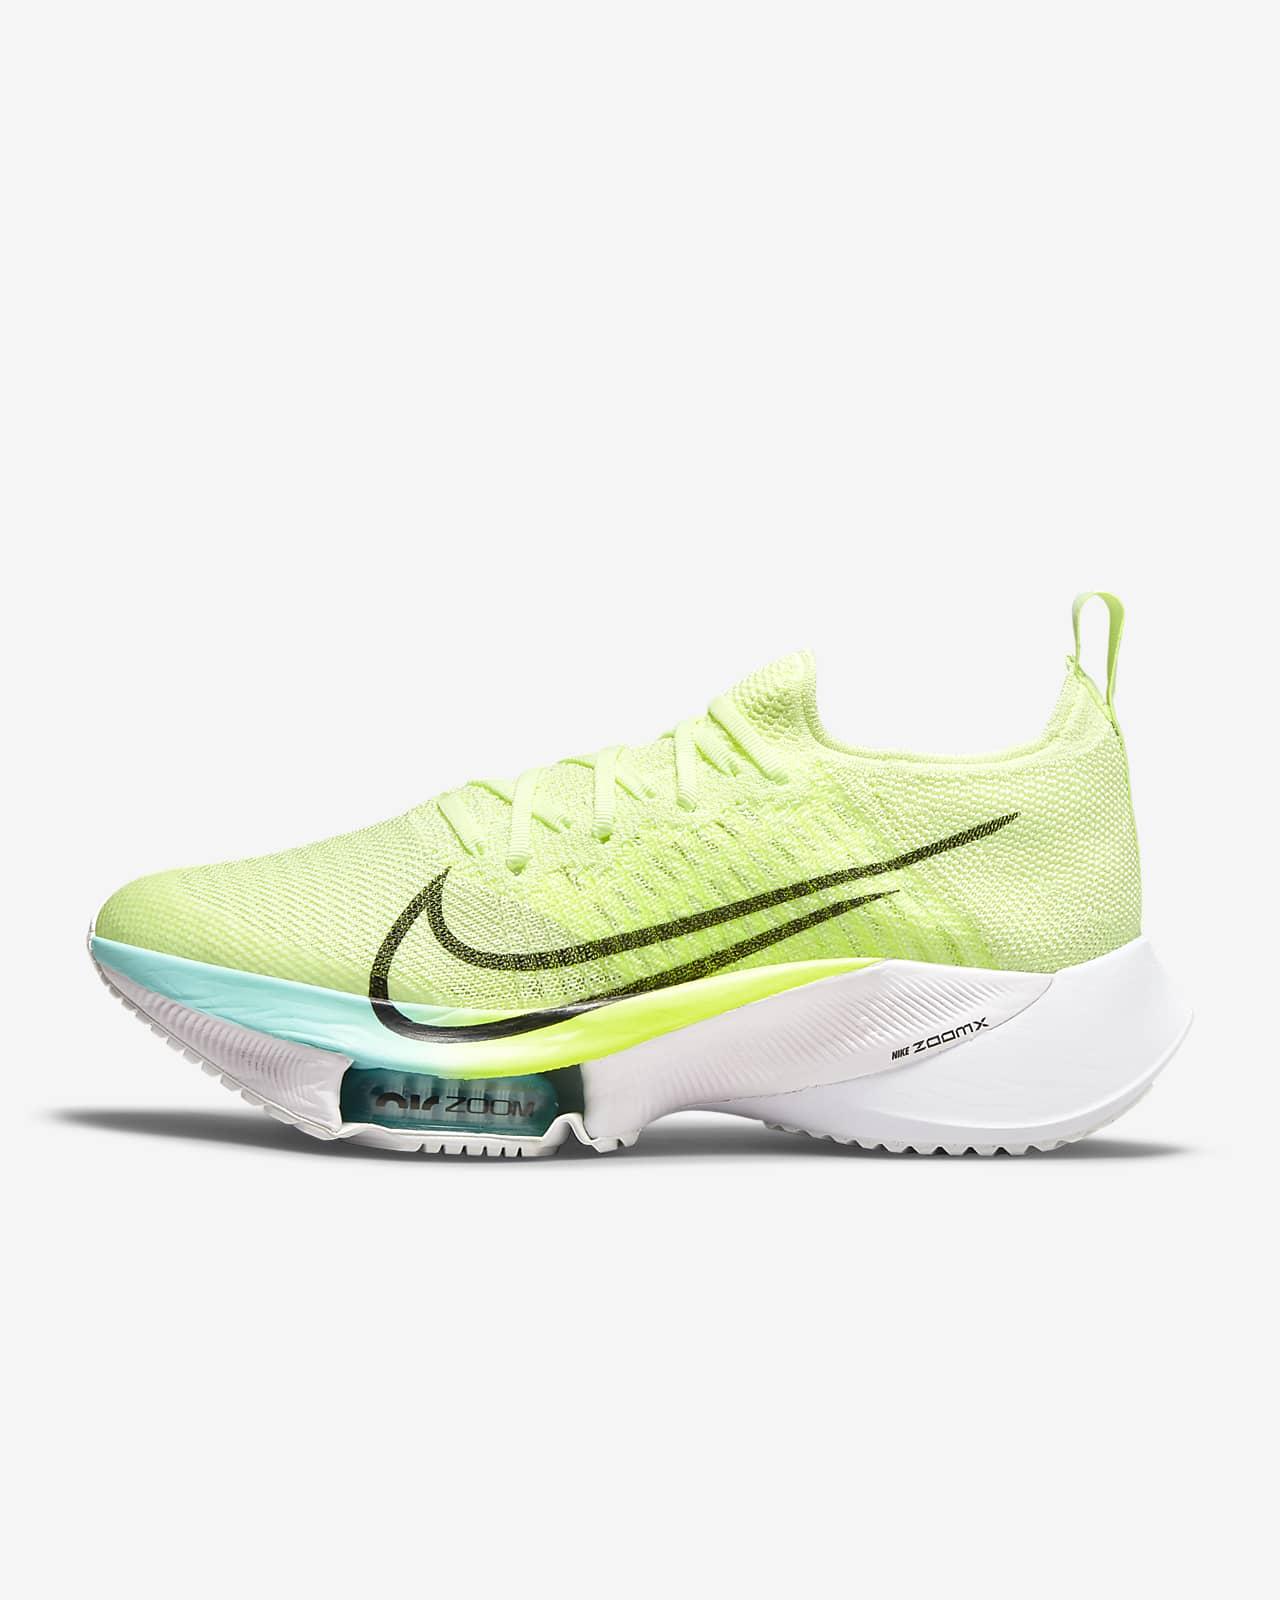 Scarpa da running su strada Nike Air Zoom Tempo NEXT% - Donna